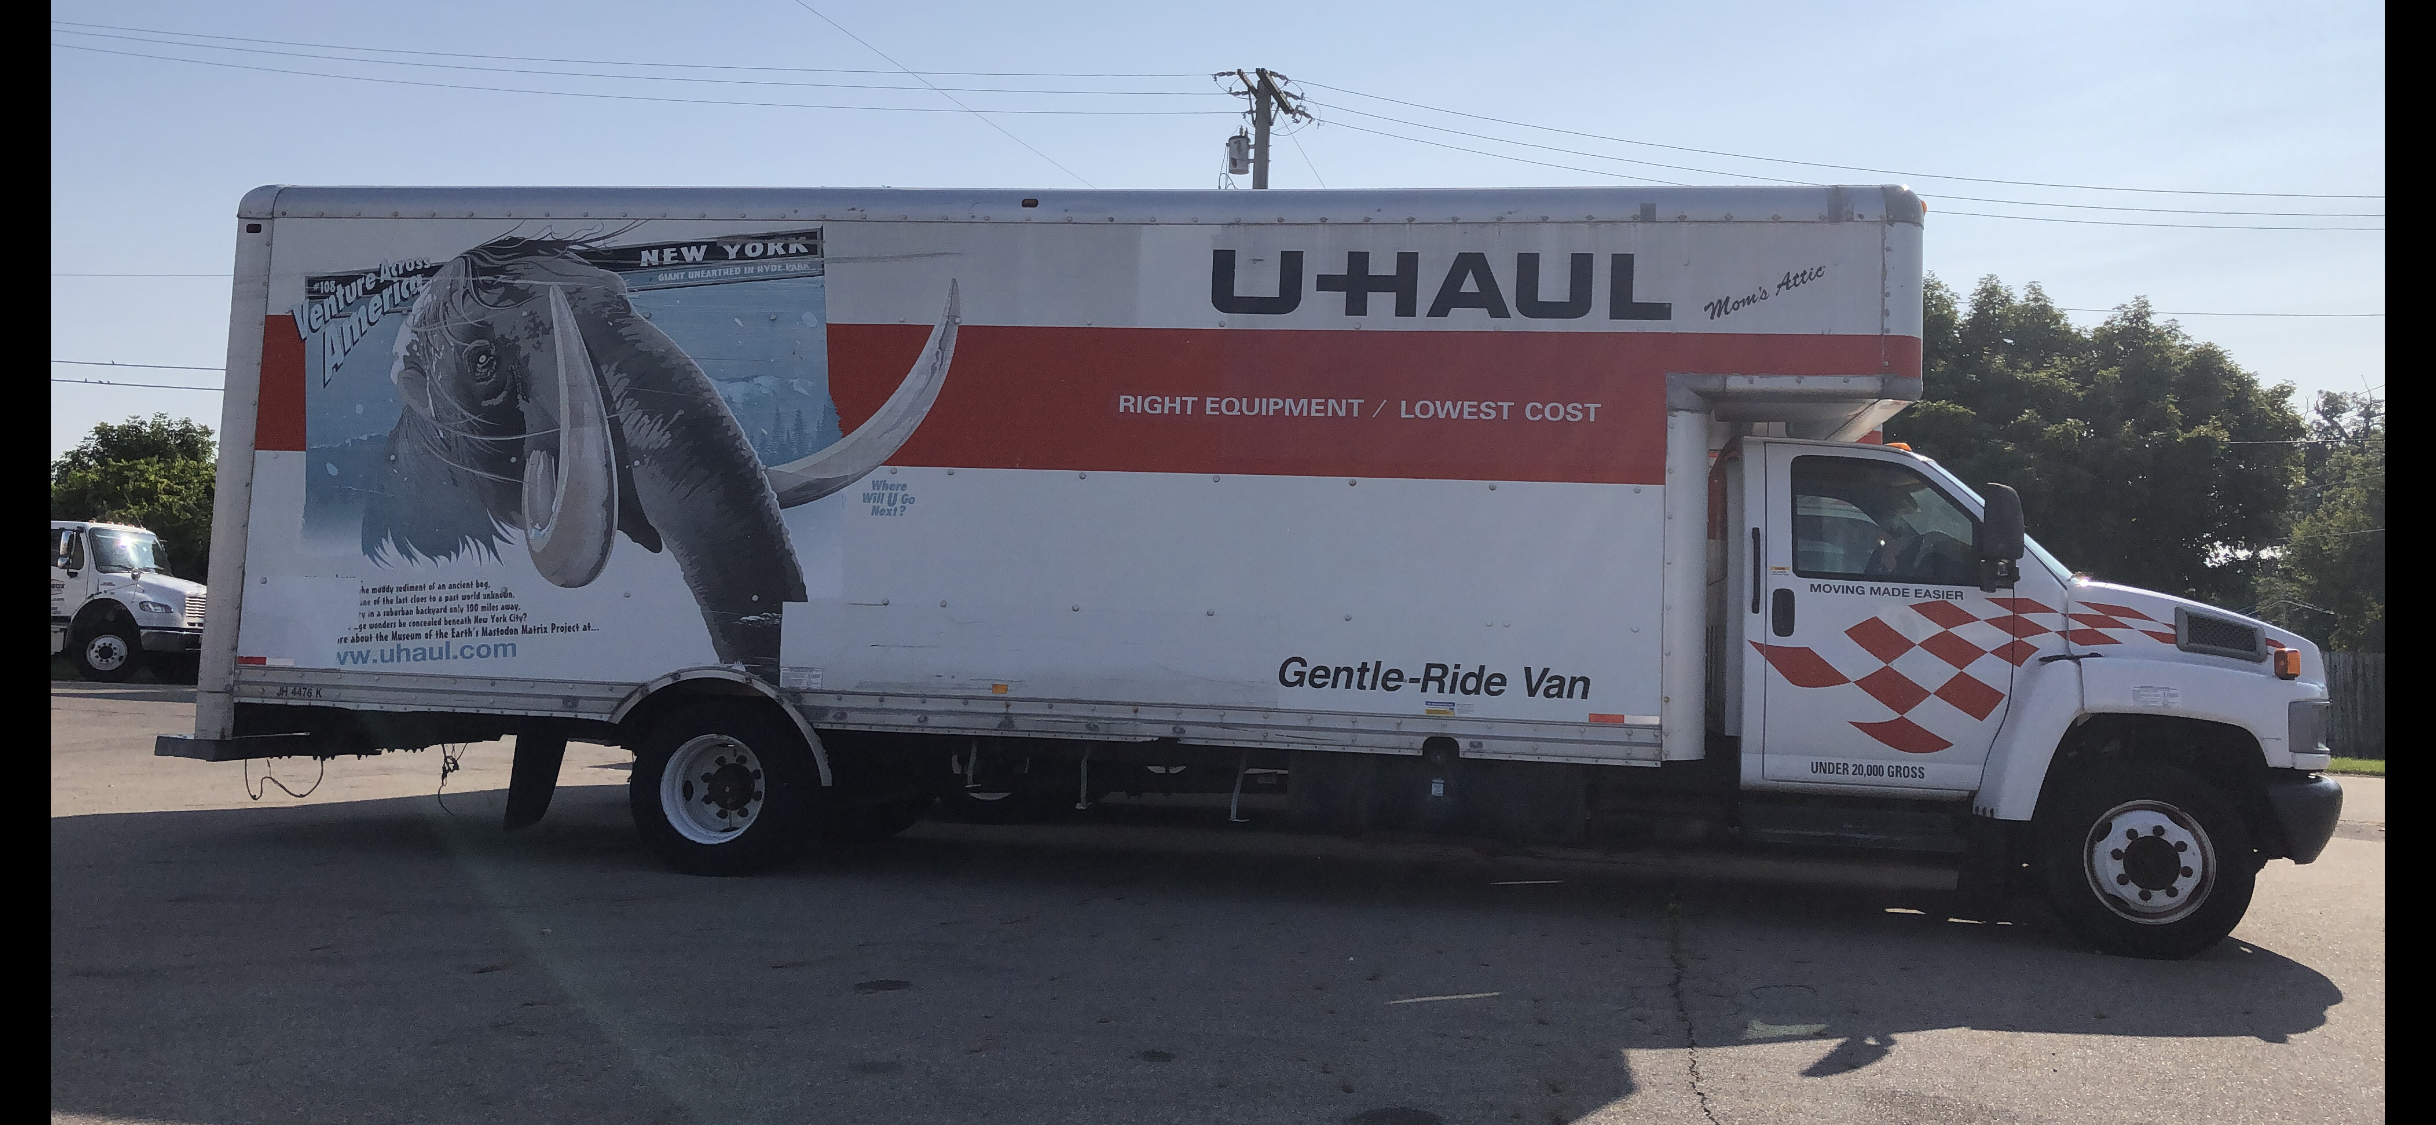 Photo of U-haul truck